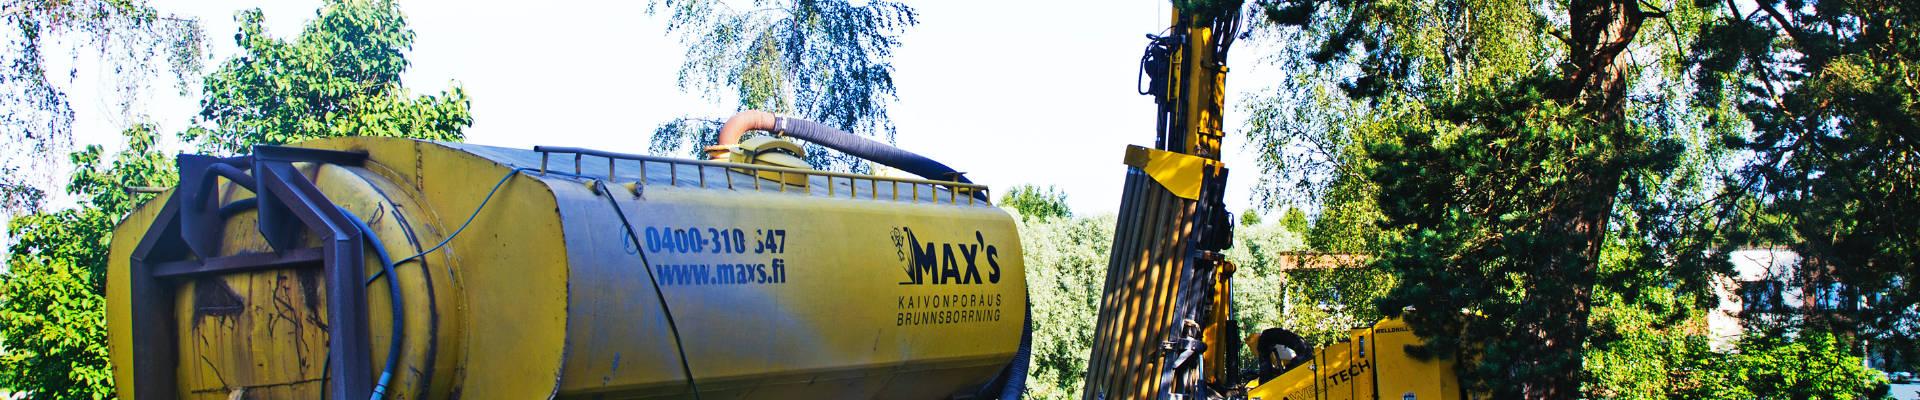 Max's brunnbornning